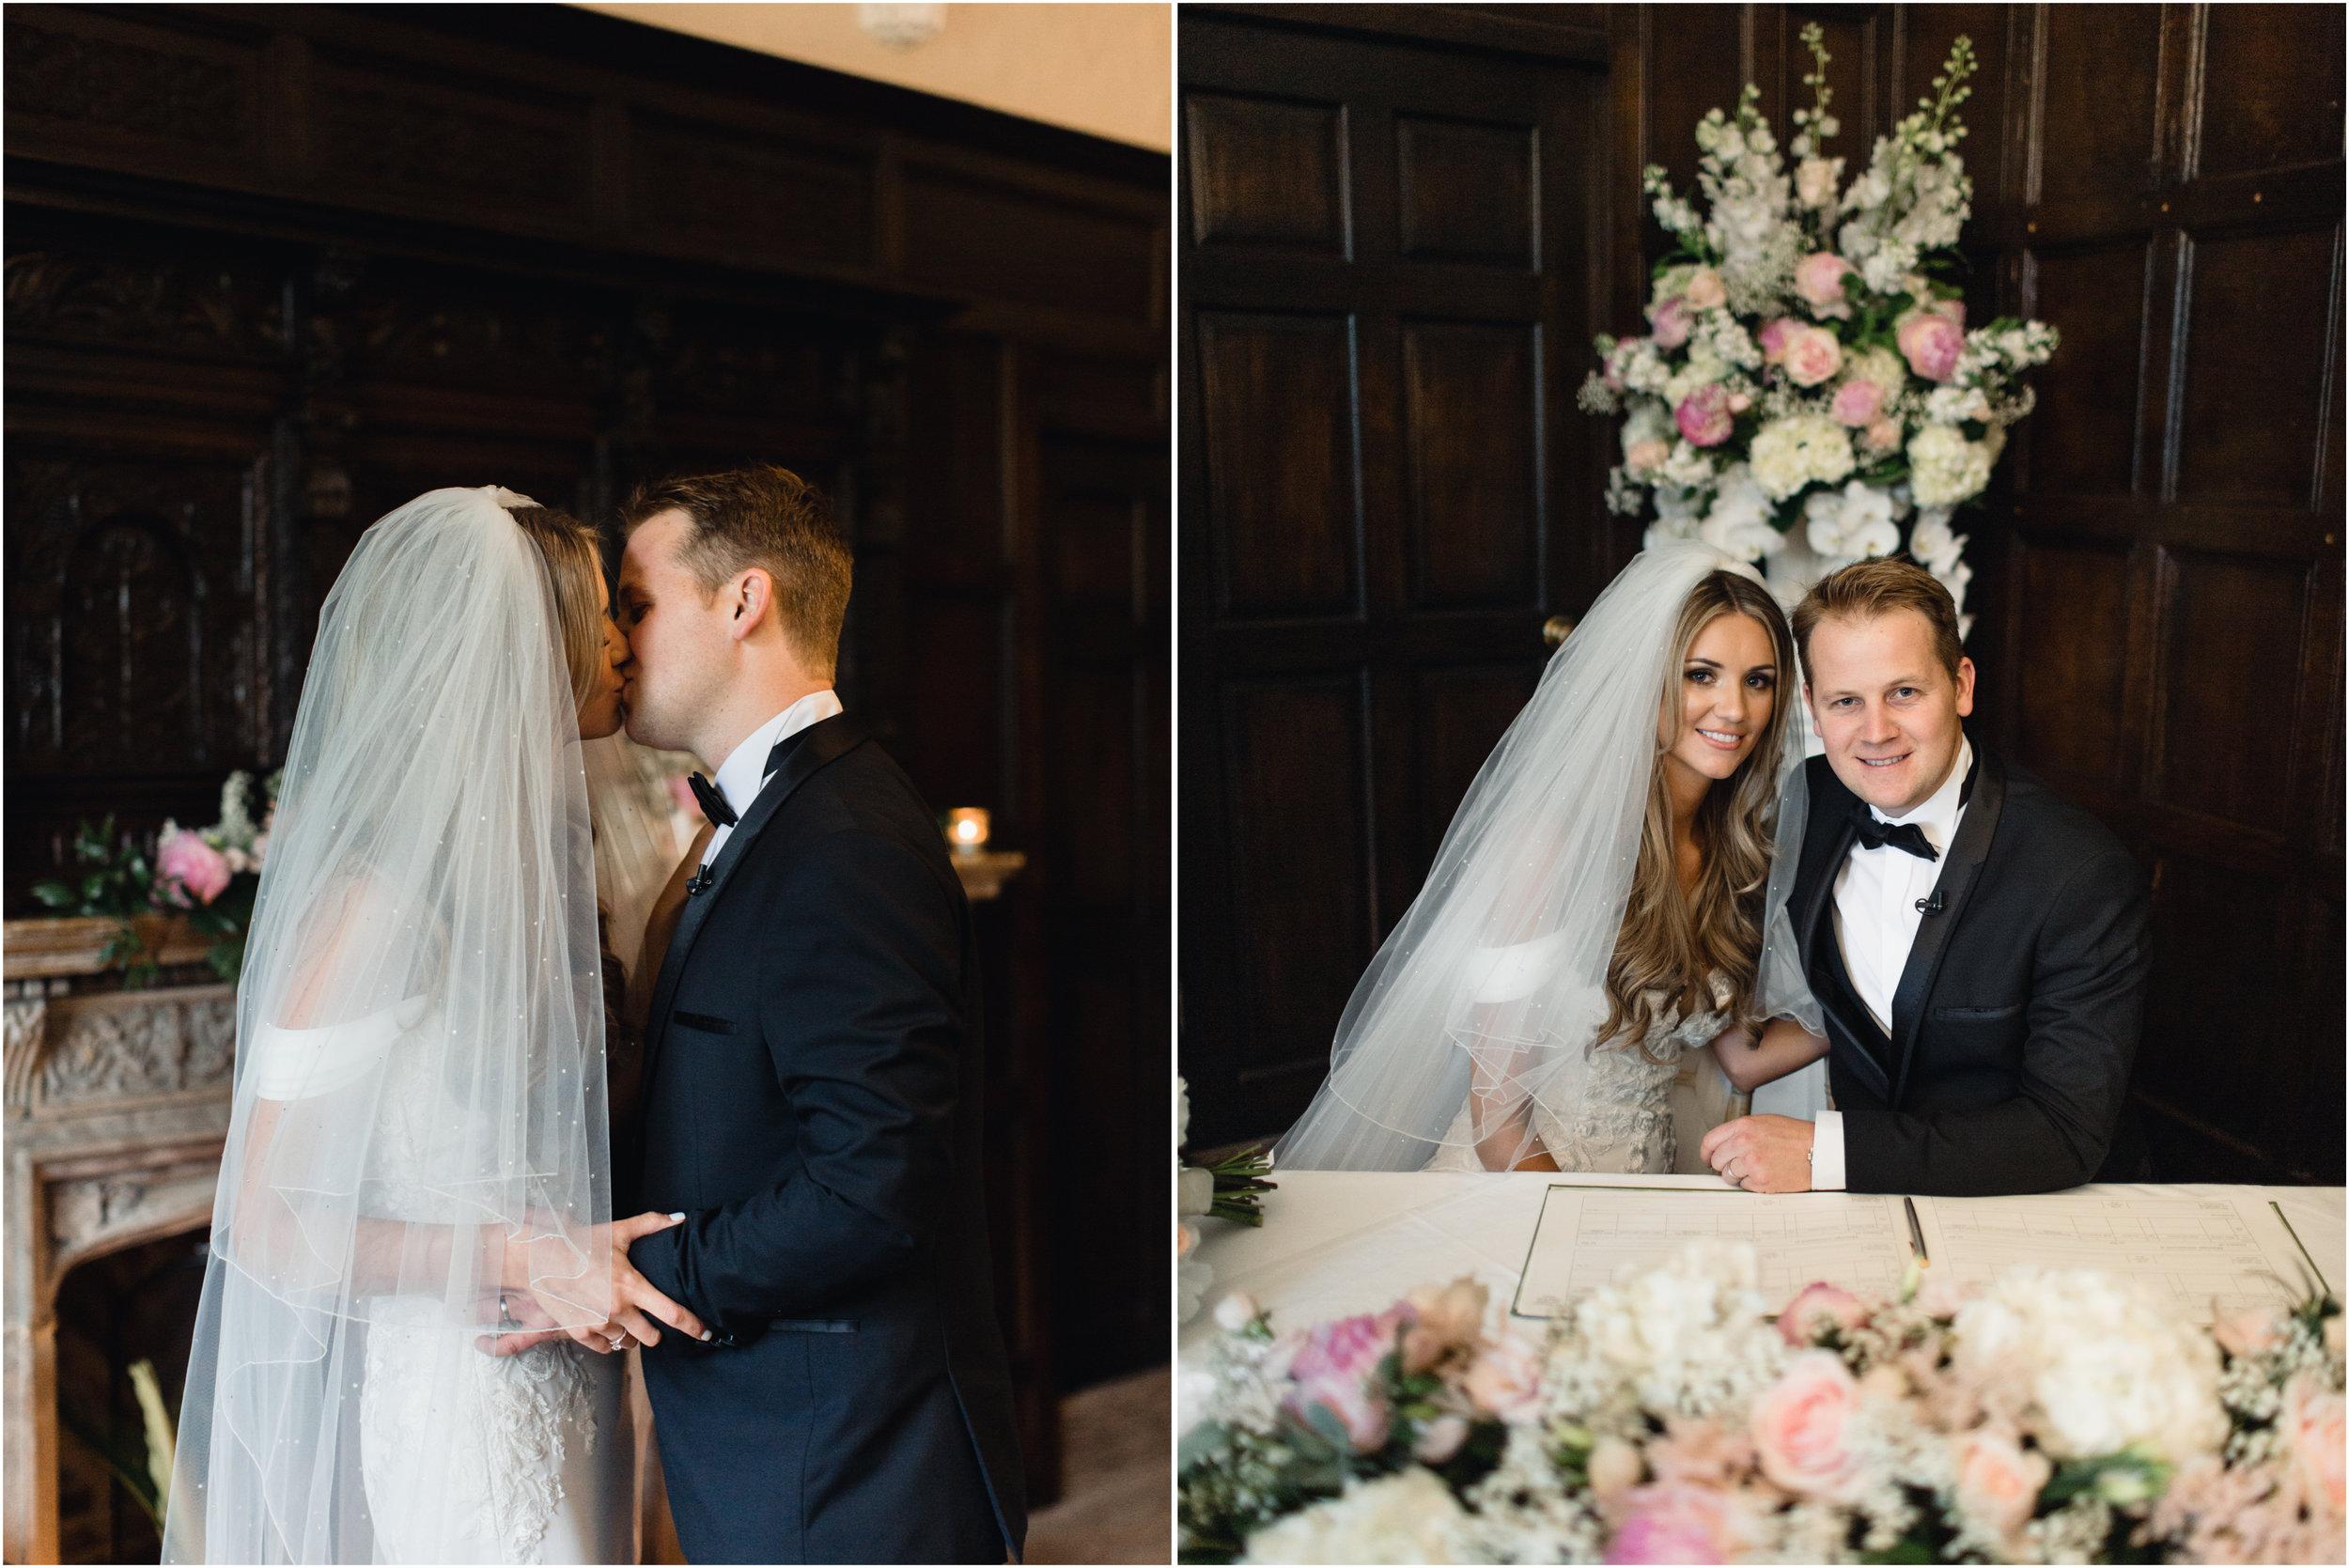 Rebecca Searle Wedding Photography Surrey London Luxury 44.jpg